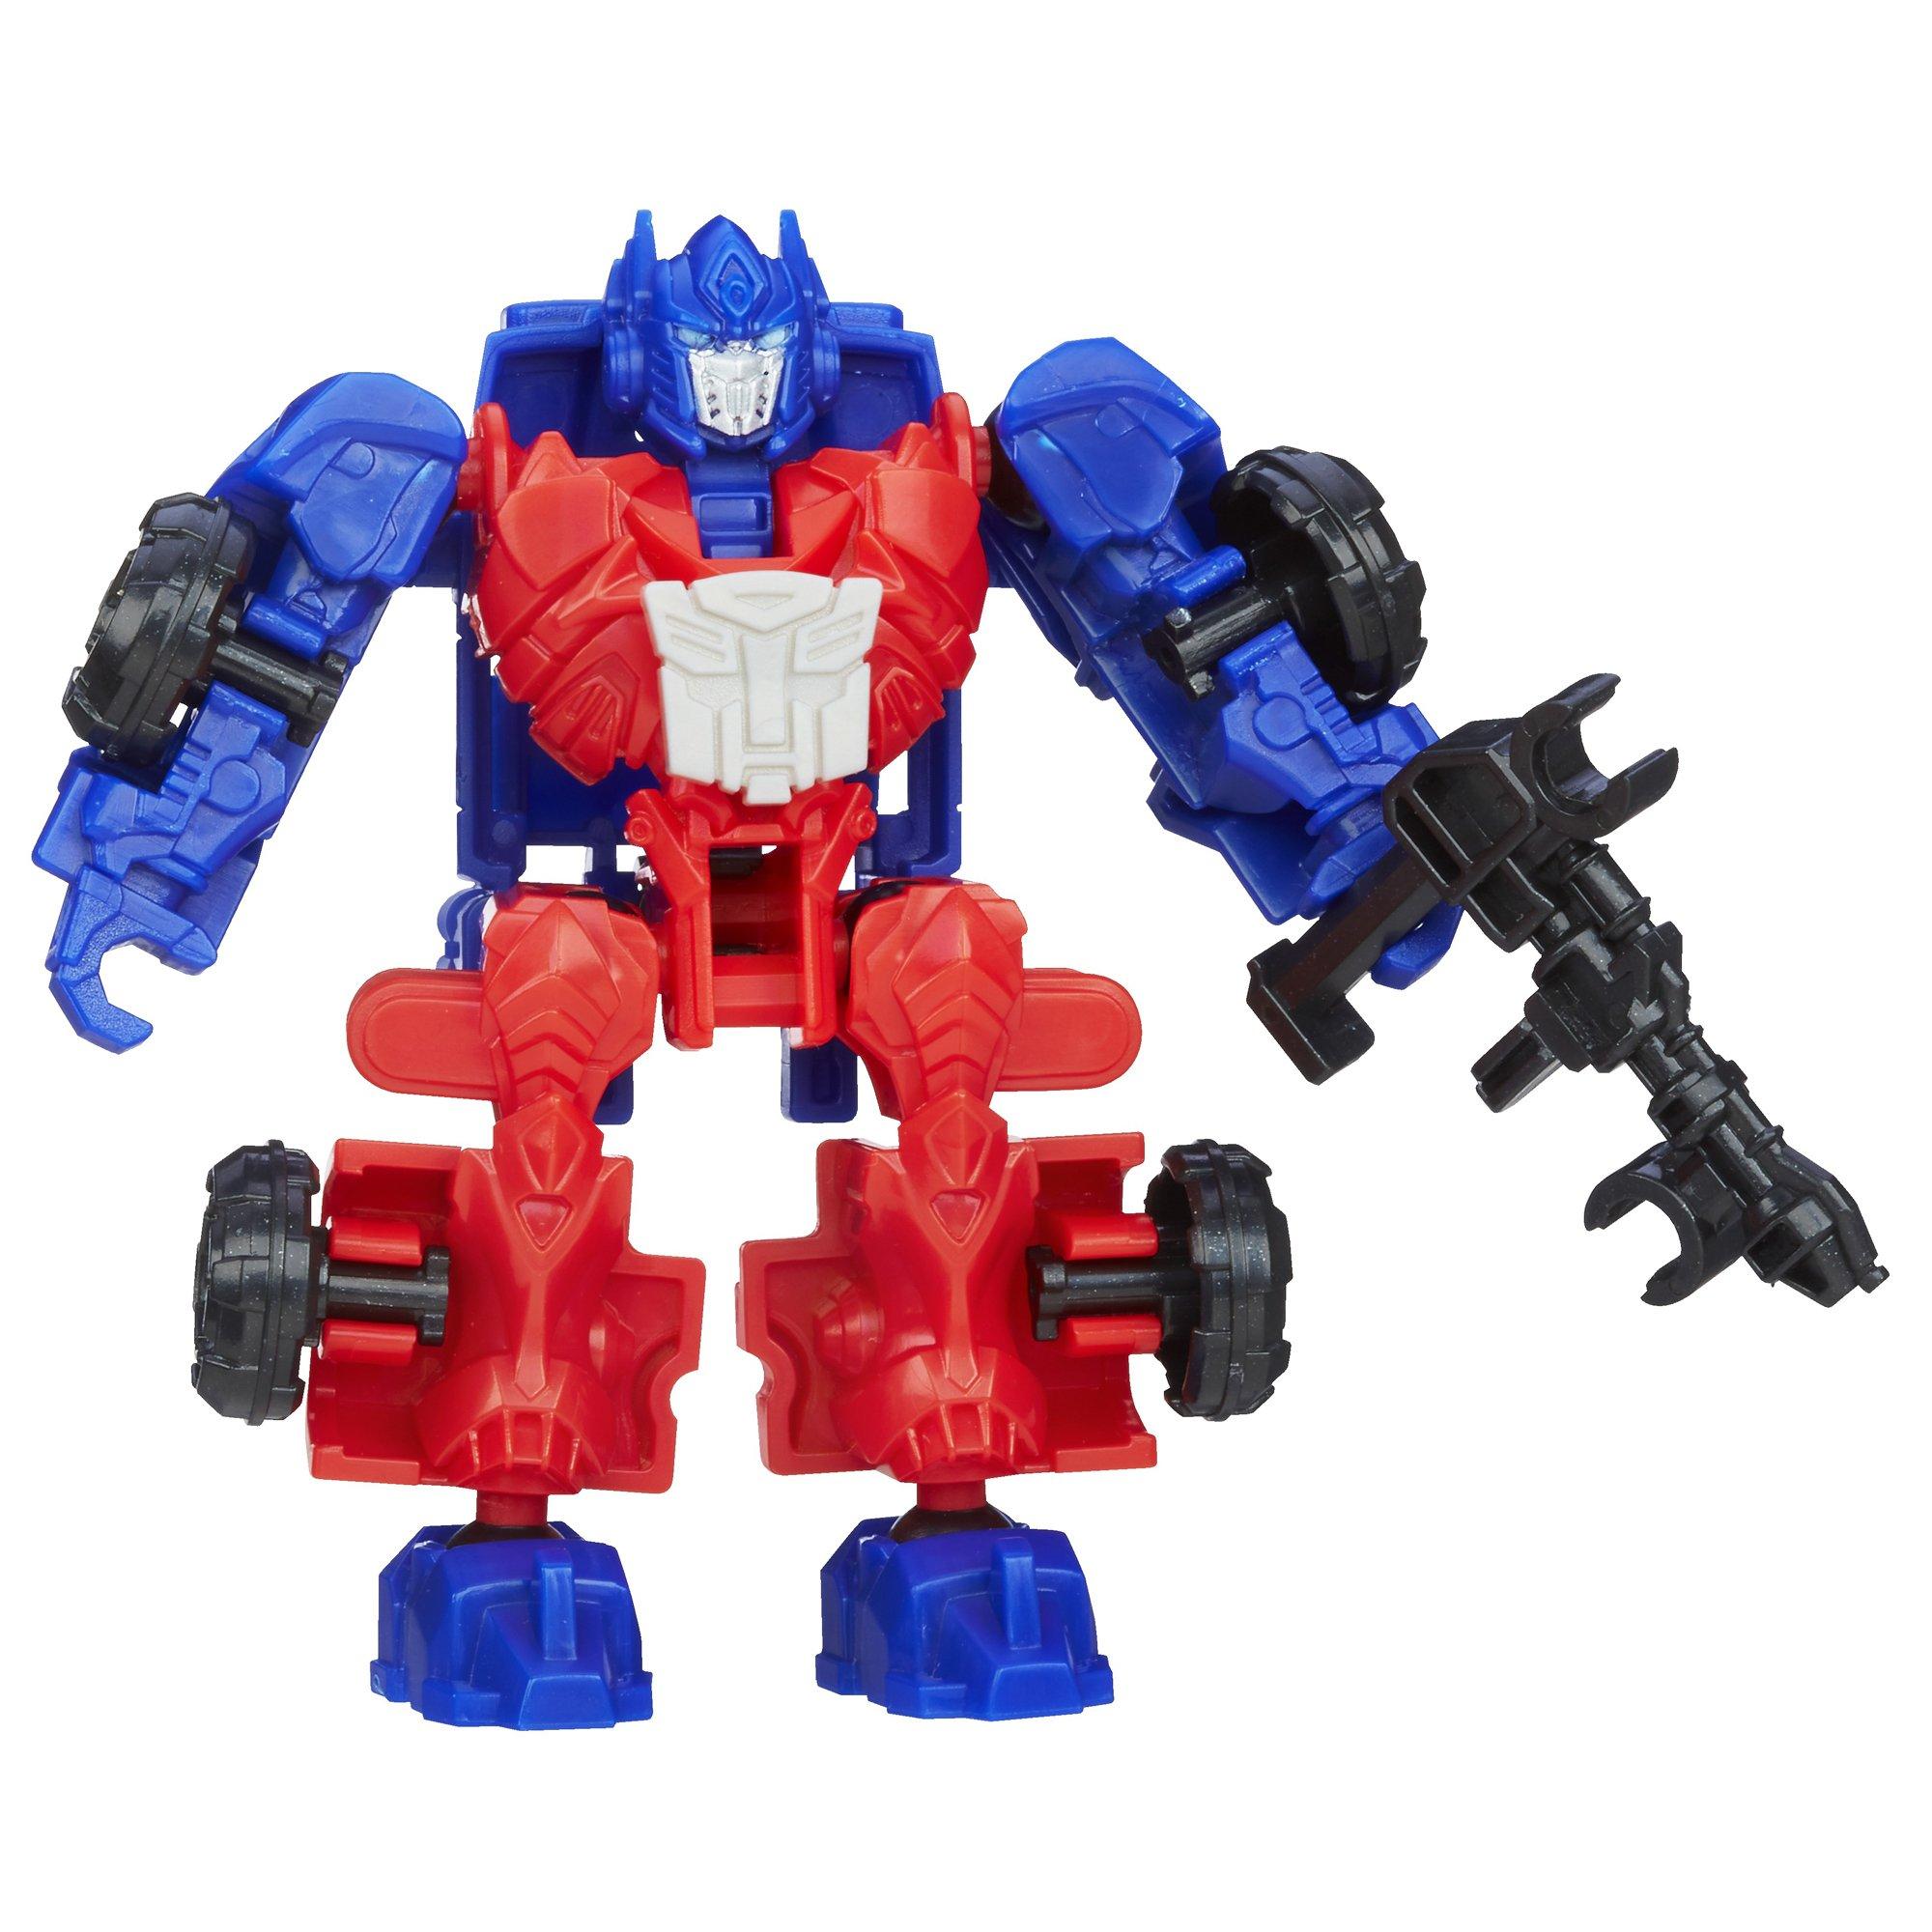 Transfrs Age of Extinction Construct-Bots Dinobot Warriors Optimus Prime /& Gnaw